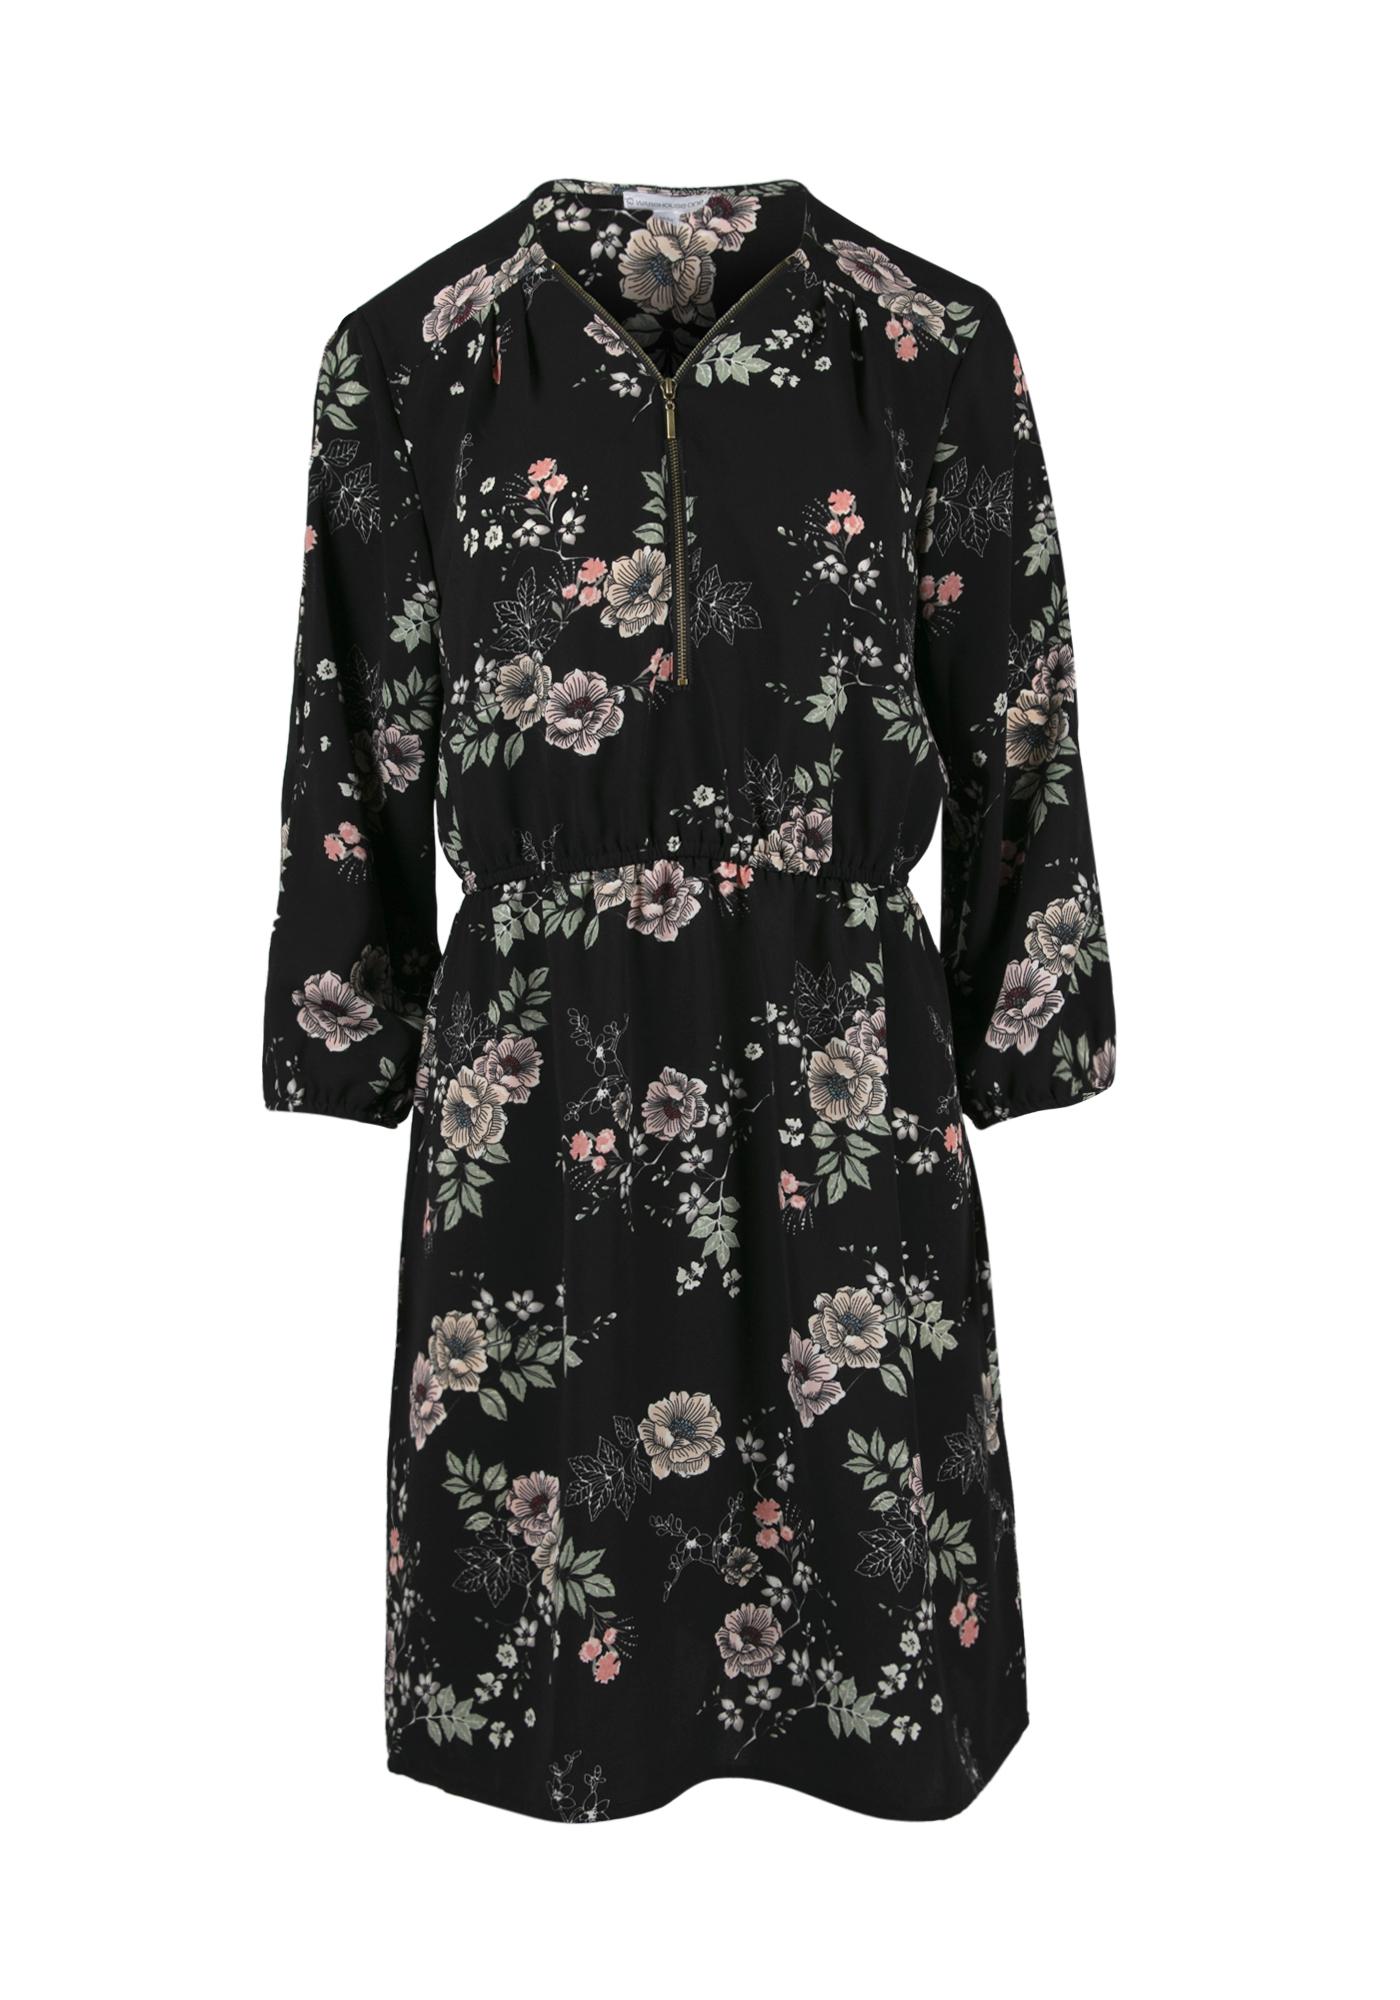 7d9437ec54aa Women s Floral Cold Shoulder Shirt Dress